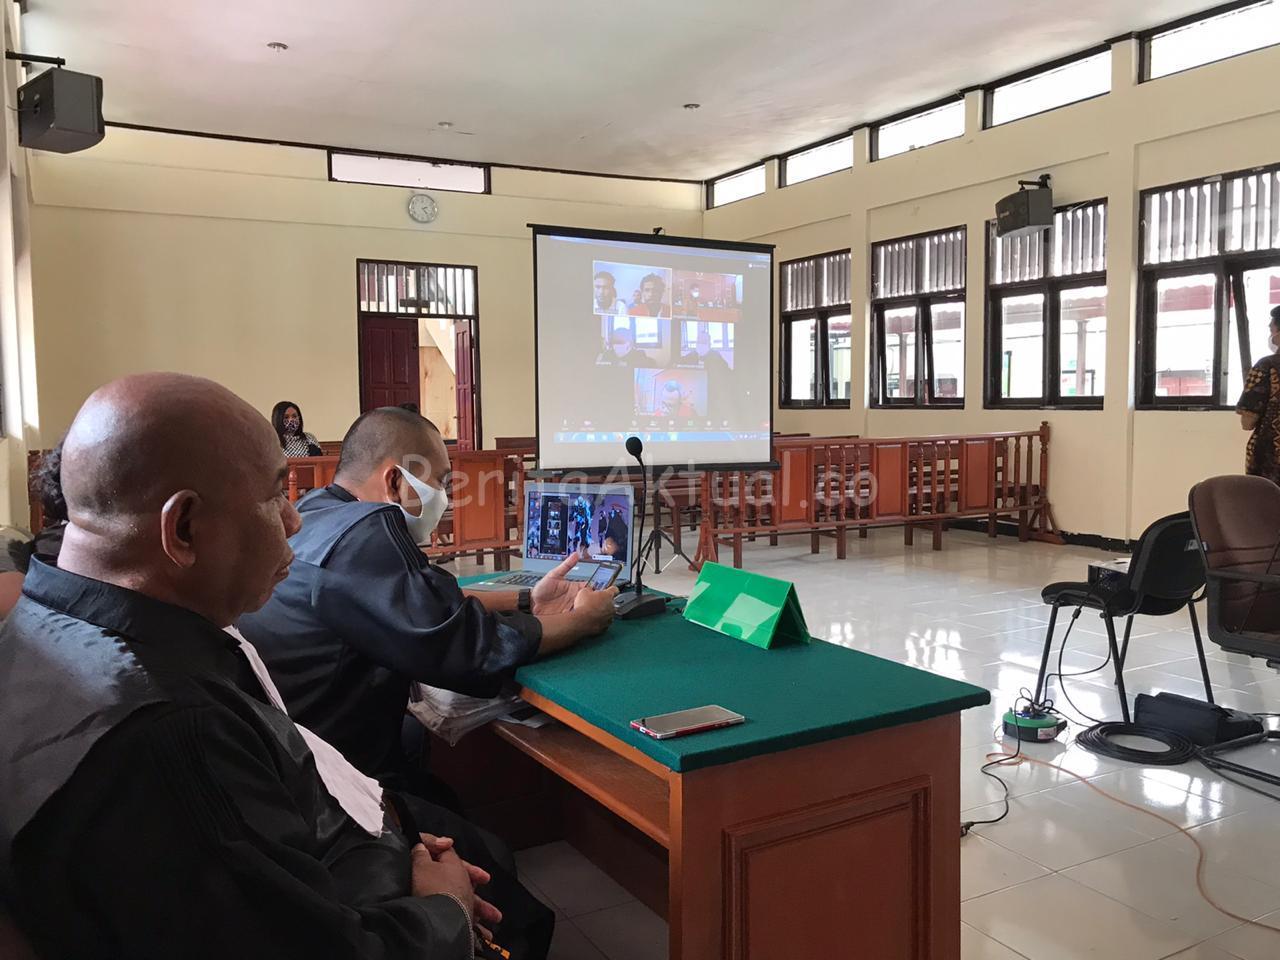 Terbukti Bersalah, 4 Terdakwa Makar di Sorong Divonis 8 Bulan 15 Hari 7 IMG 20200528 WA0131